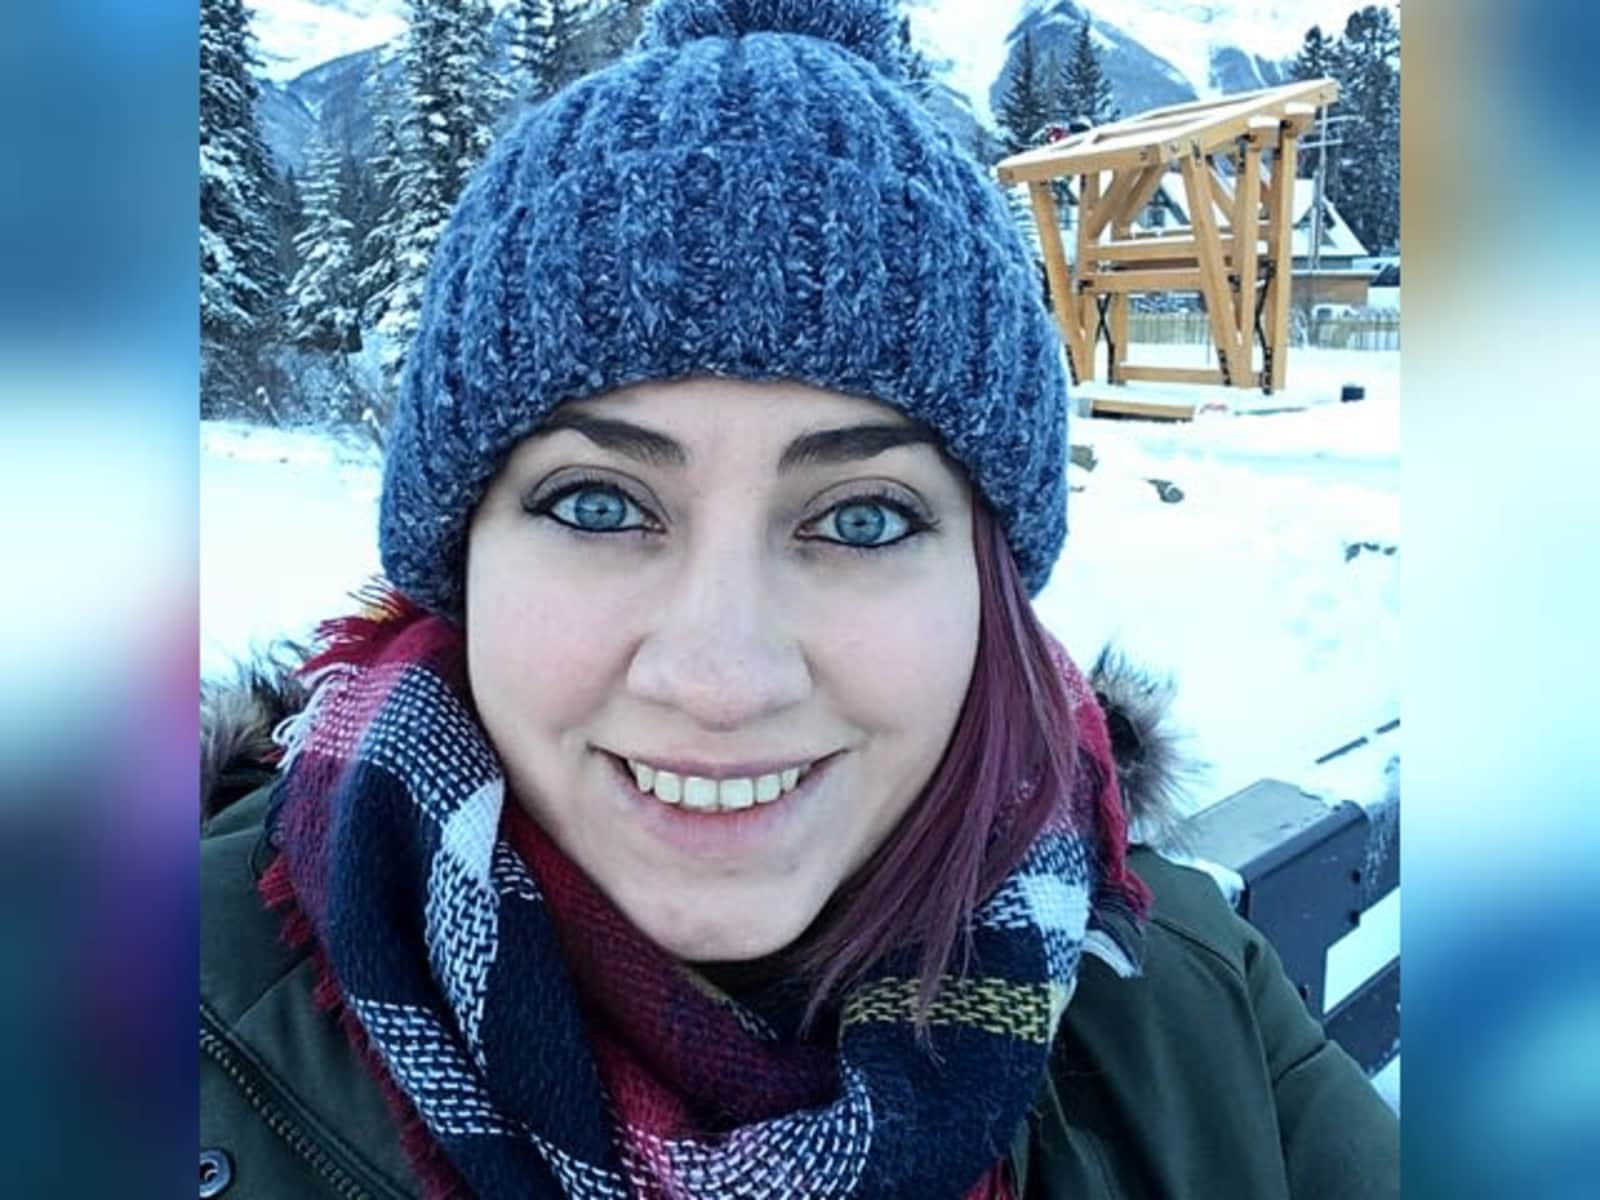 Ally from Edmonton, Alberta, Canada